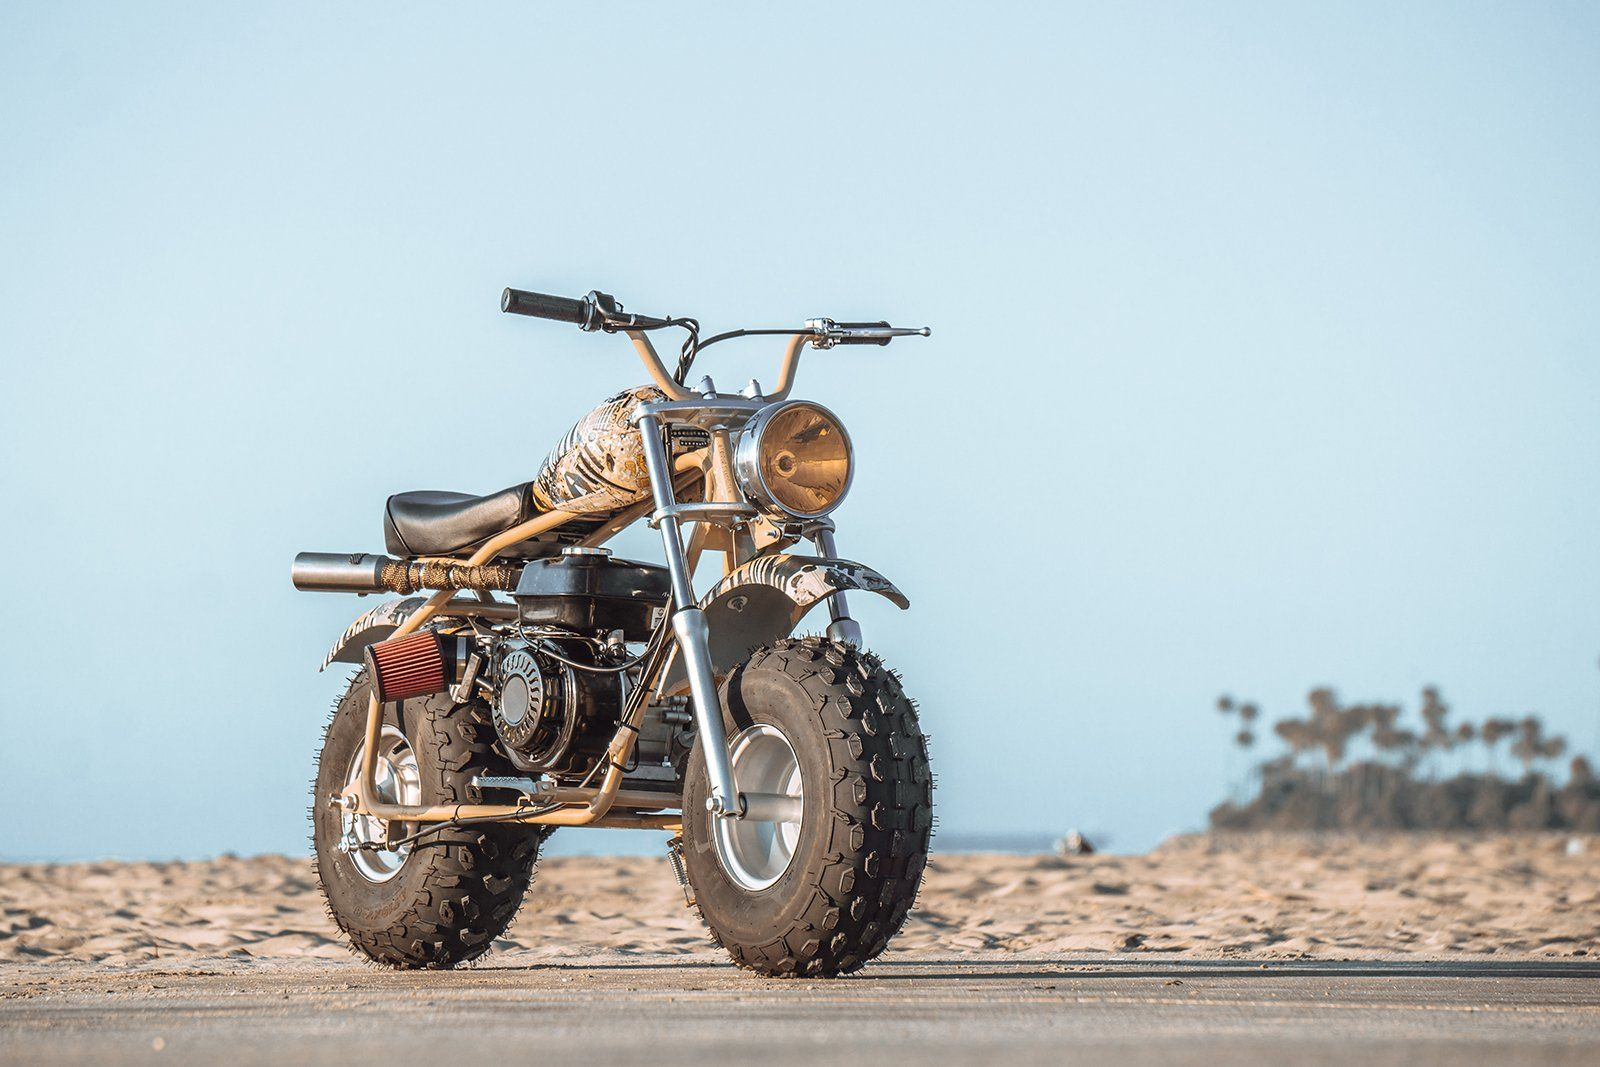 Coleman Ct 200u Ex Lit L Smokey Mini Motorbike Mini Bike Vespa Vintage